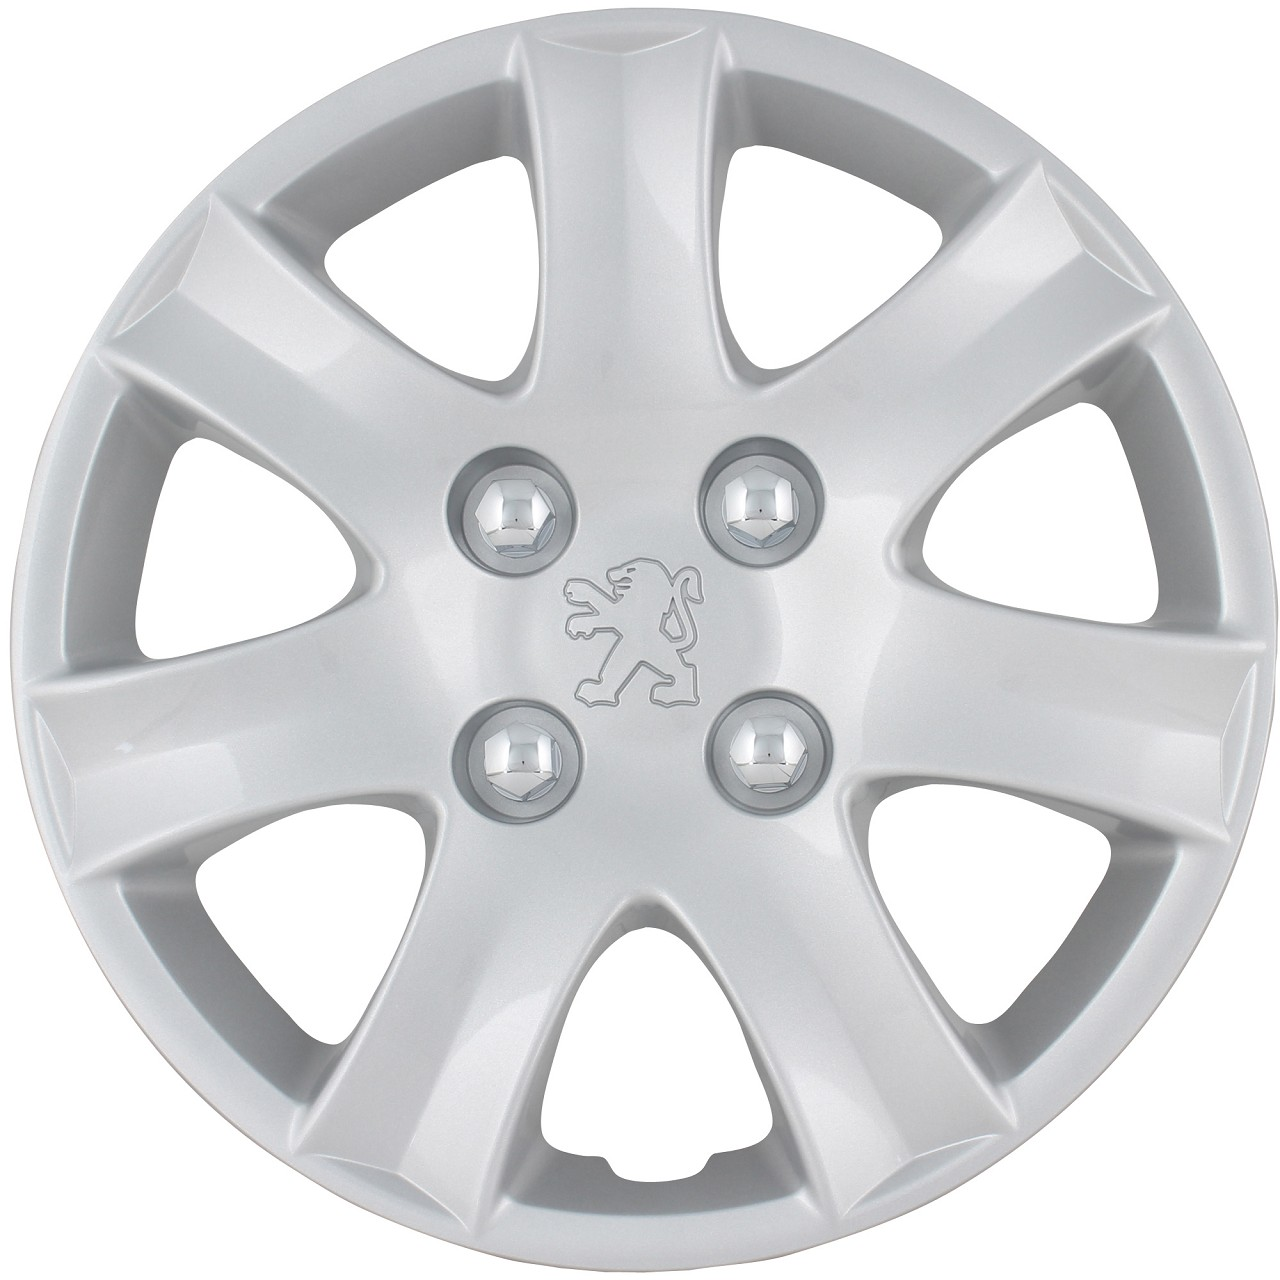 ORIGINAL Peugeot Radkappe Radblende 14 Zoll SPA SILBER (1 Stück) 206+ 5416.R0